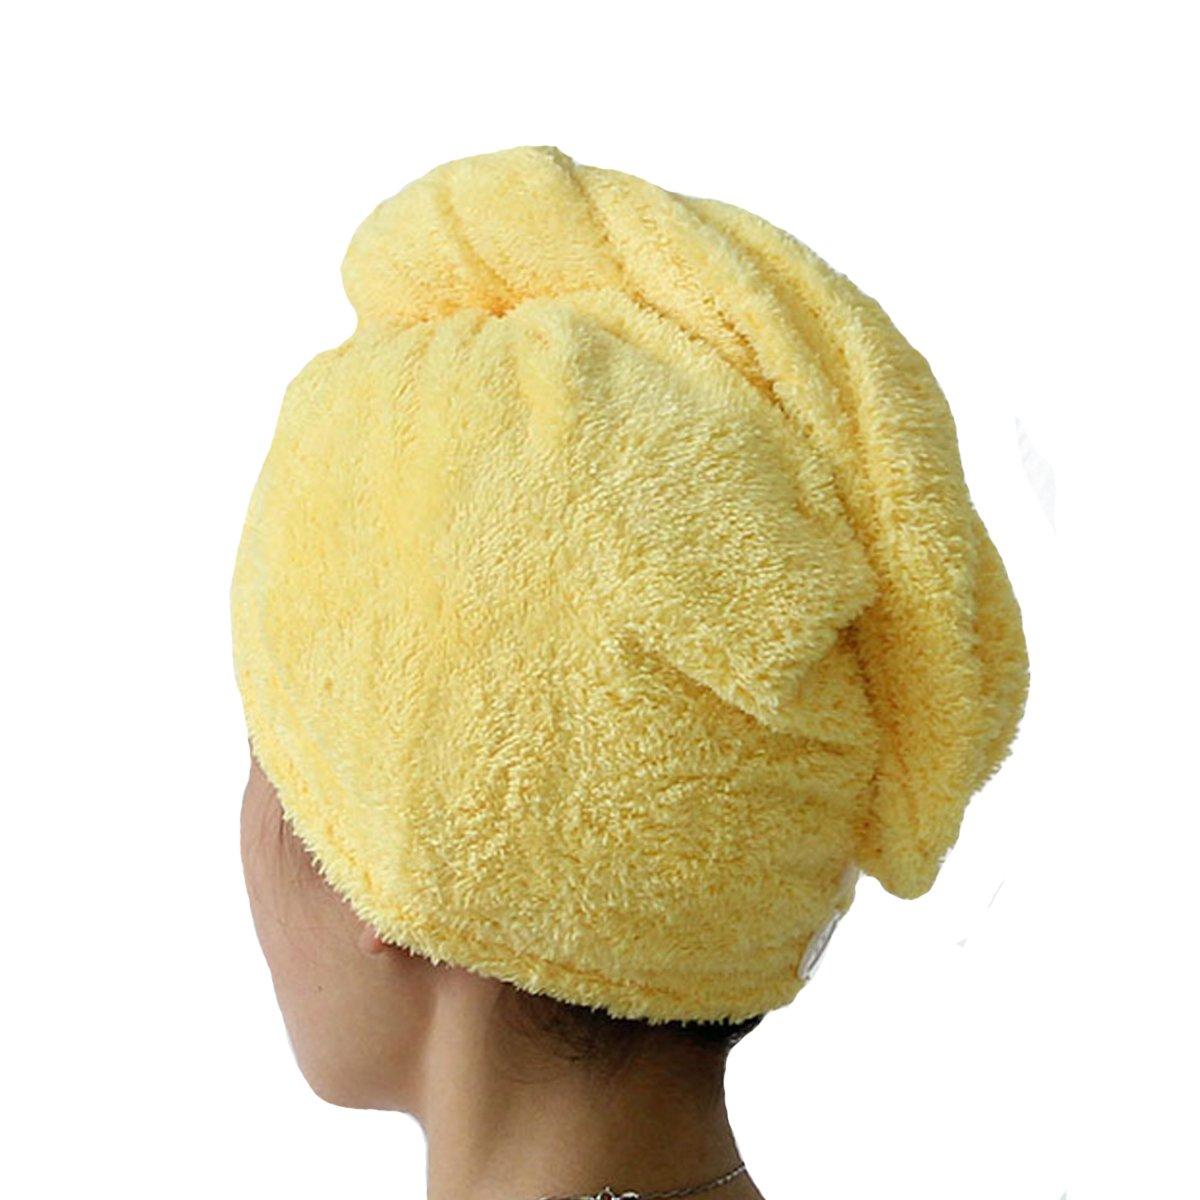 ZLMBAGUK Microfiber Hair Turban, Hair Towel Wrap Turban- Super Absorbent, Unique Design, Rainbow Rainbow (Hot Pink)